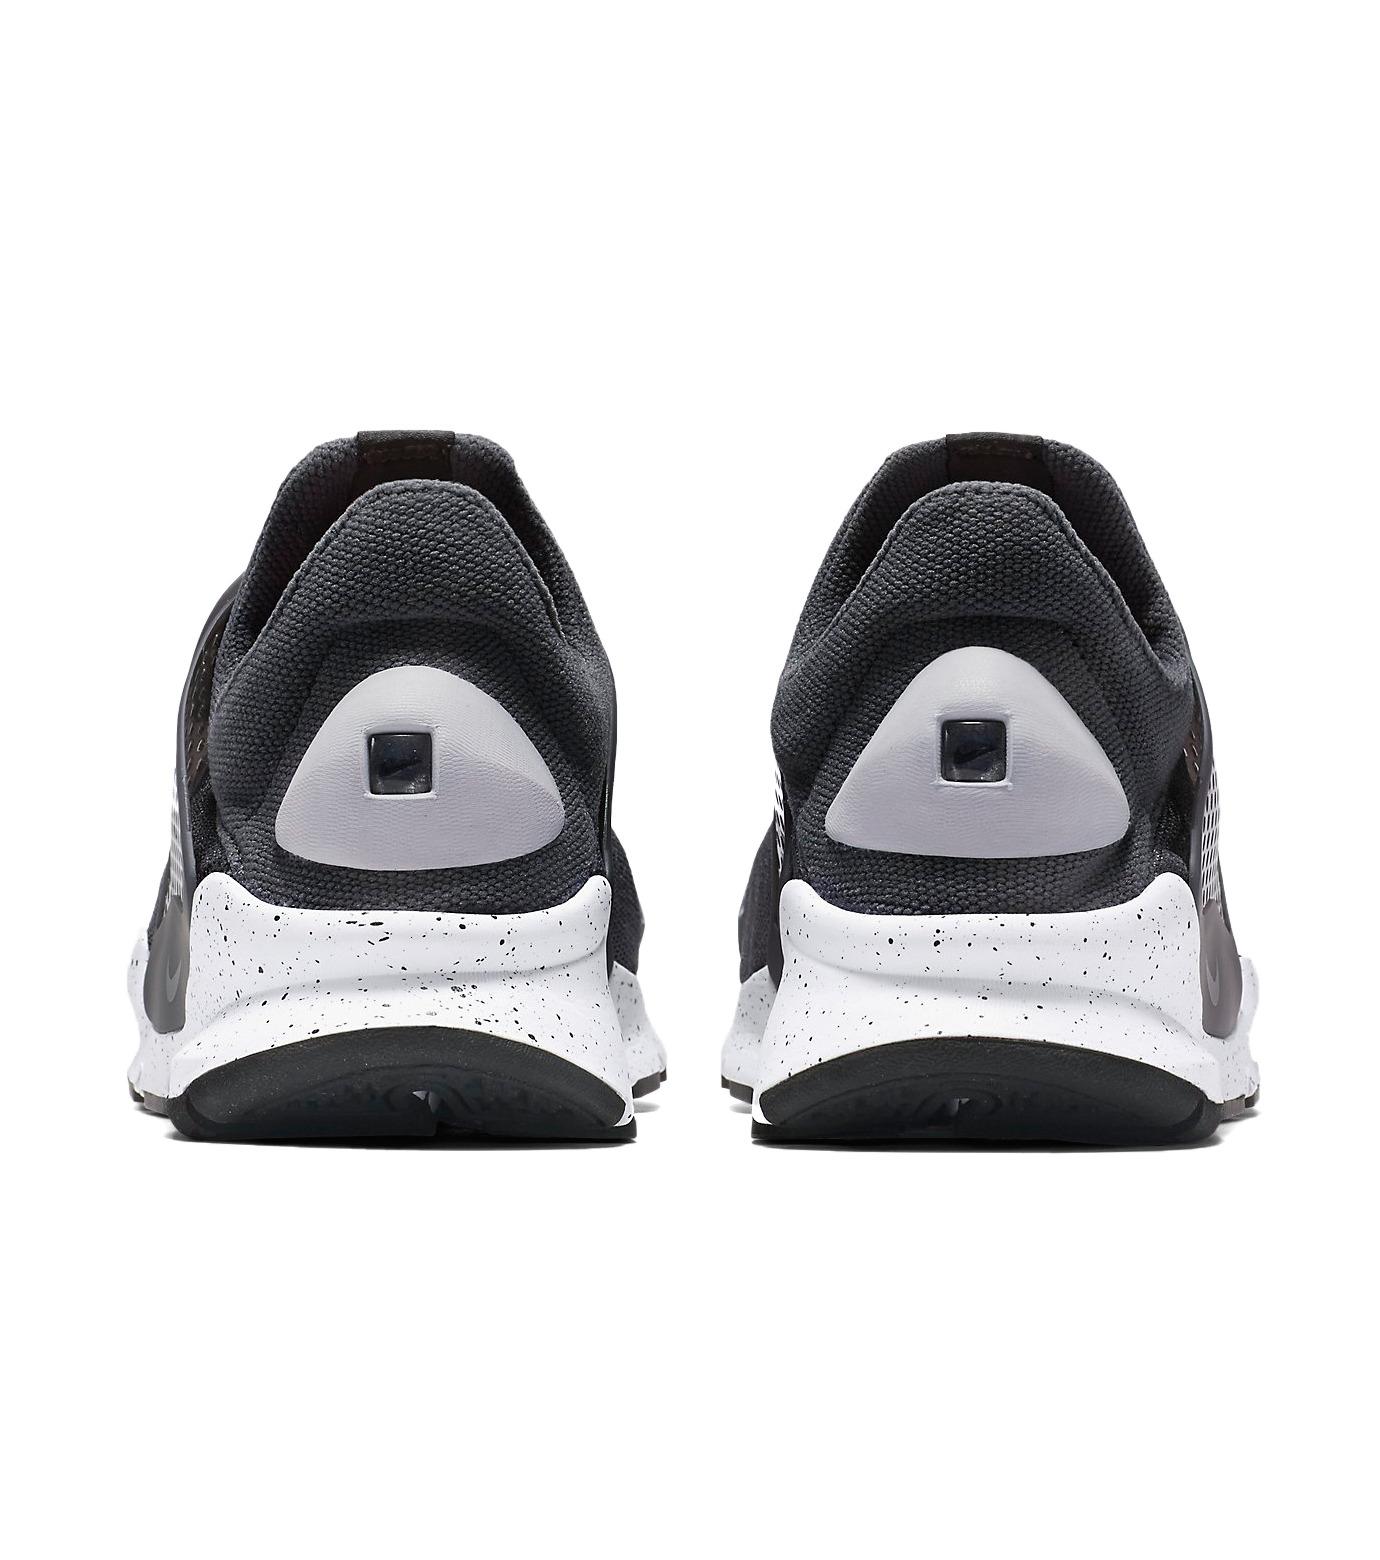 NIKE(ナイキ)のSOCK DART-GRAY(シューズ/shoes)-819686-003-11 拡大詳細画像5